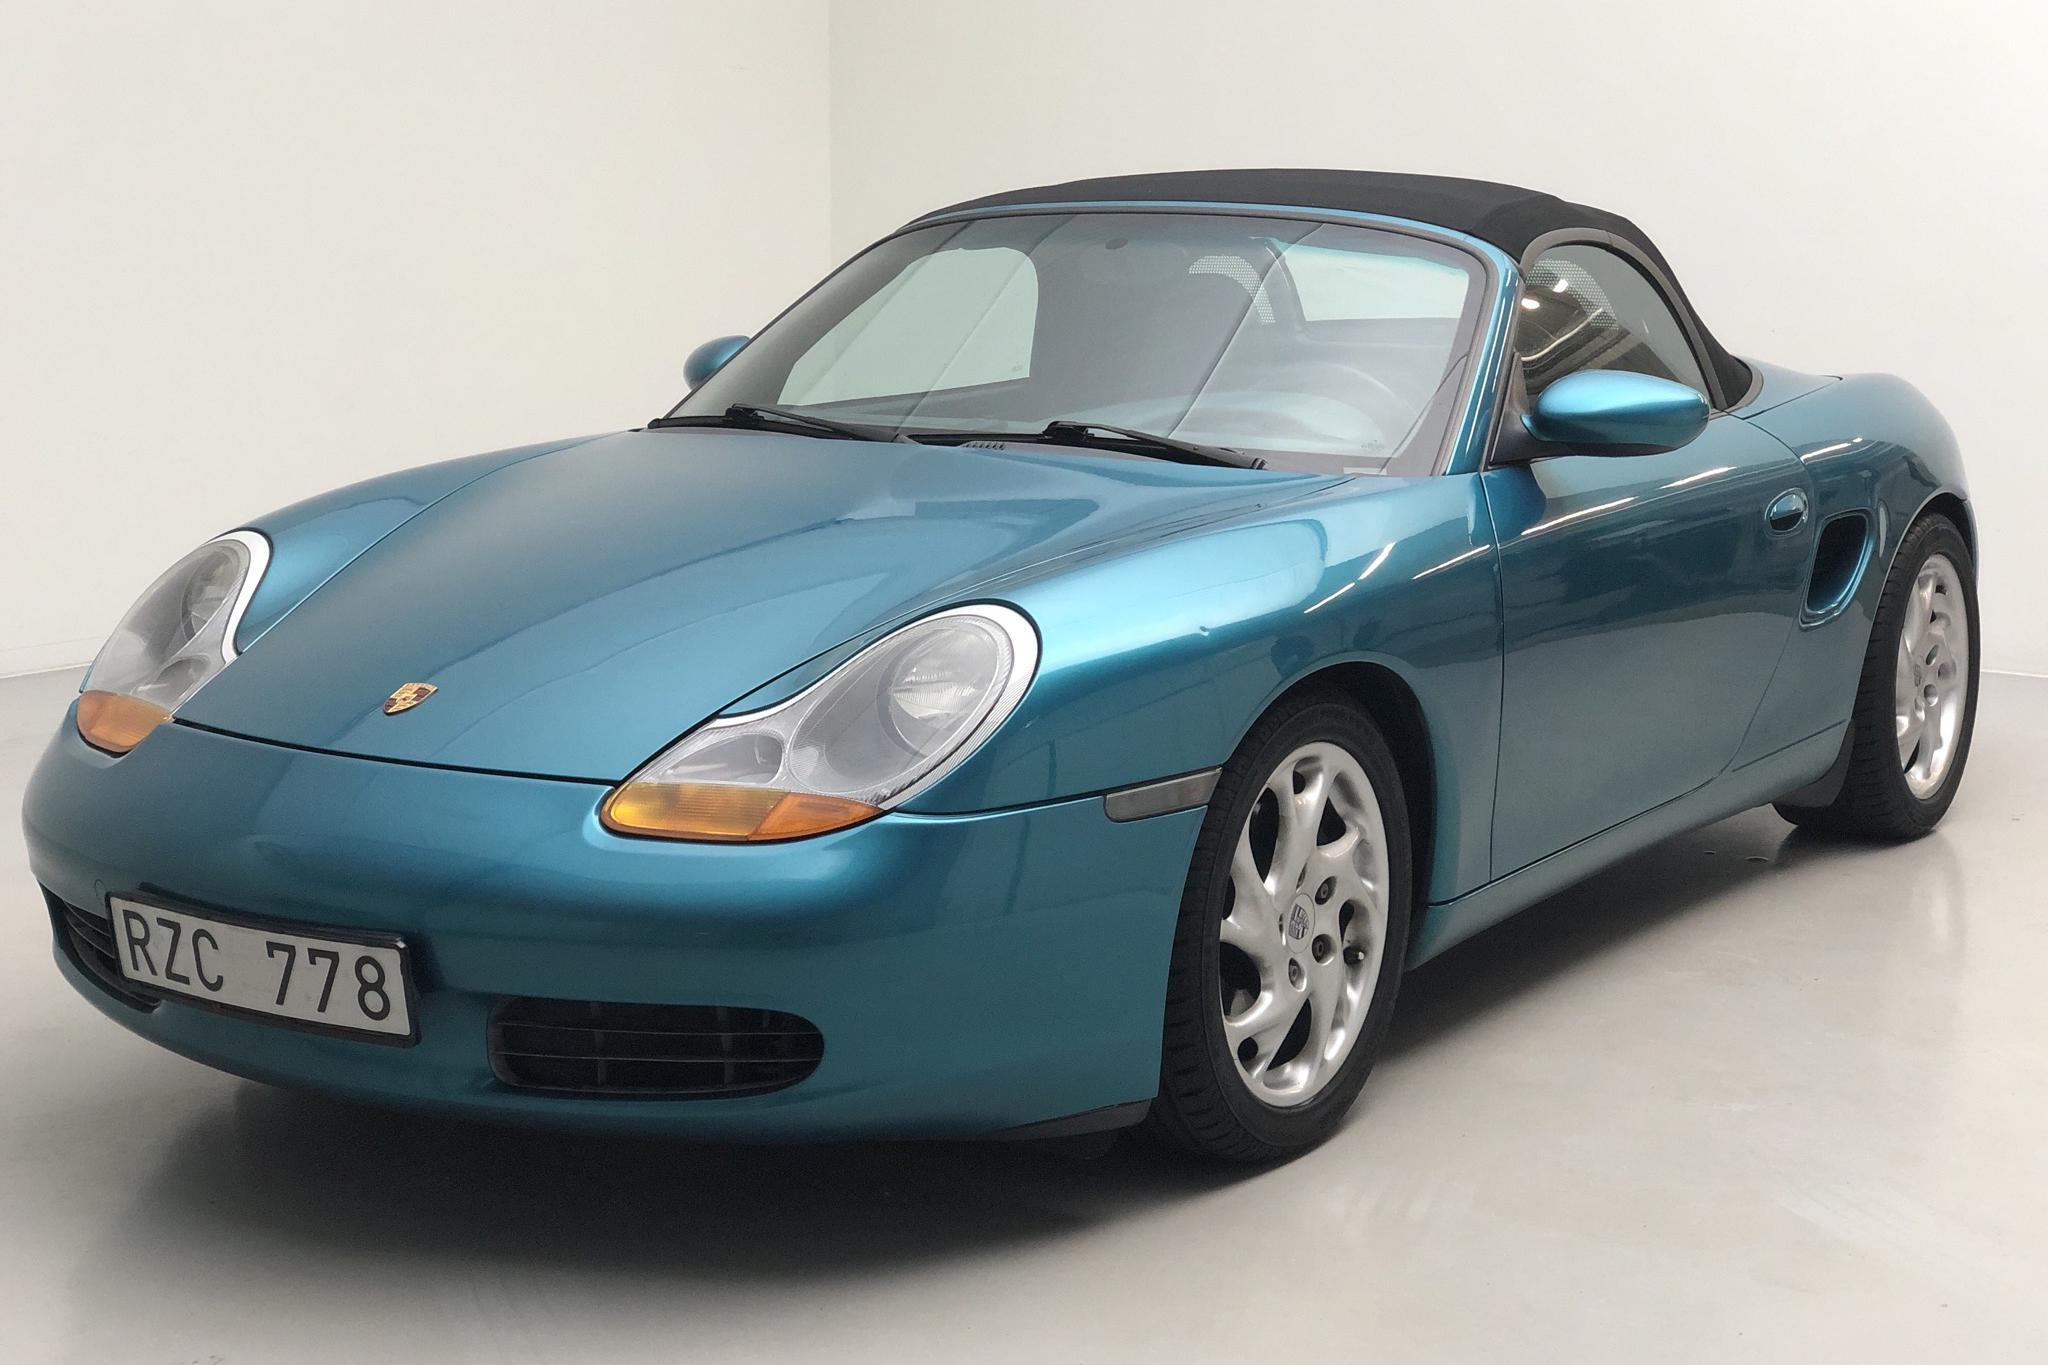 Porsche Boxster 2.5 (204hk) - 9 066 mil - Manuell - grön - 1997